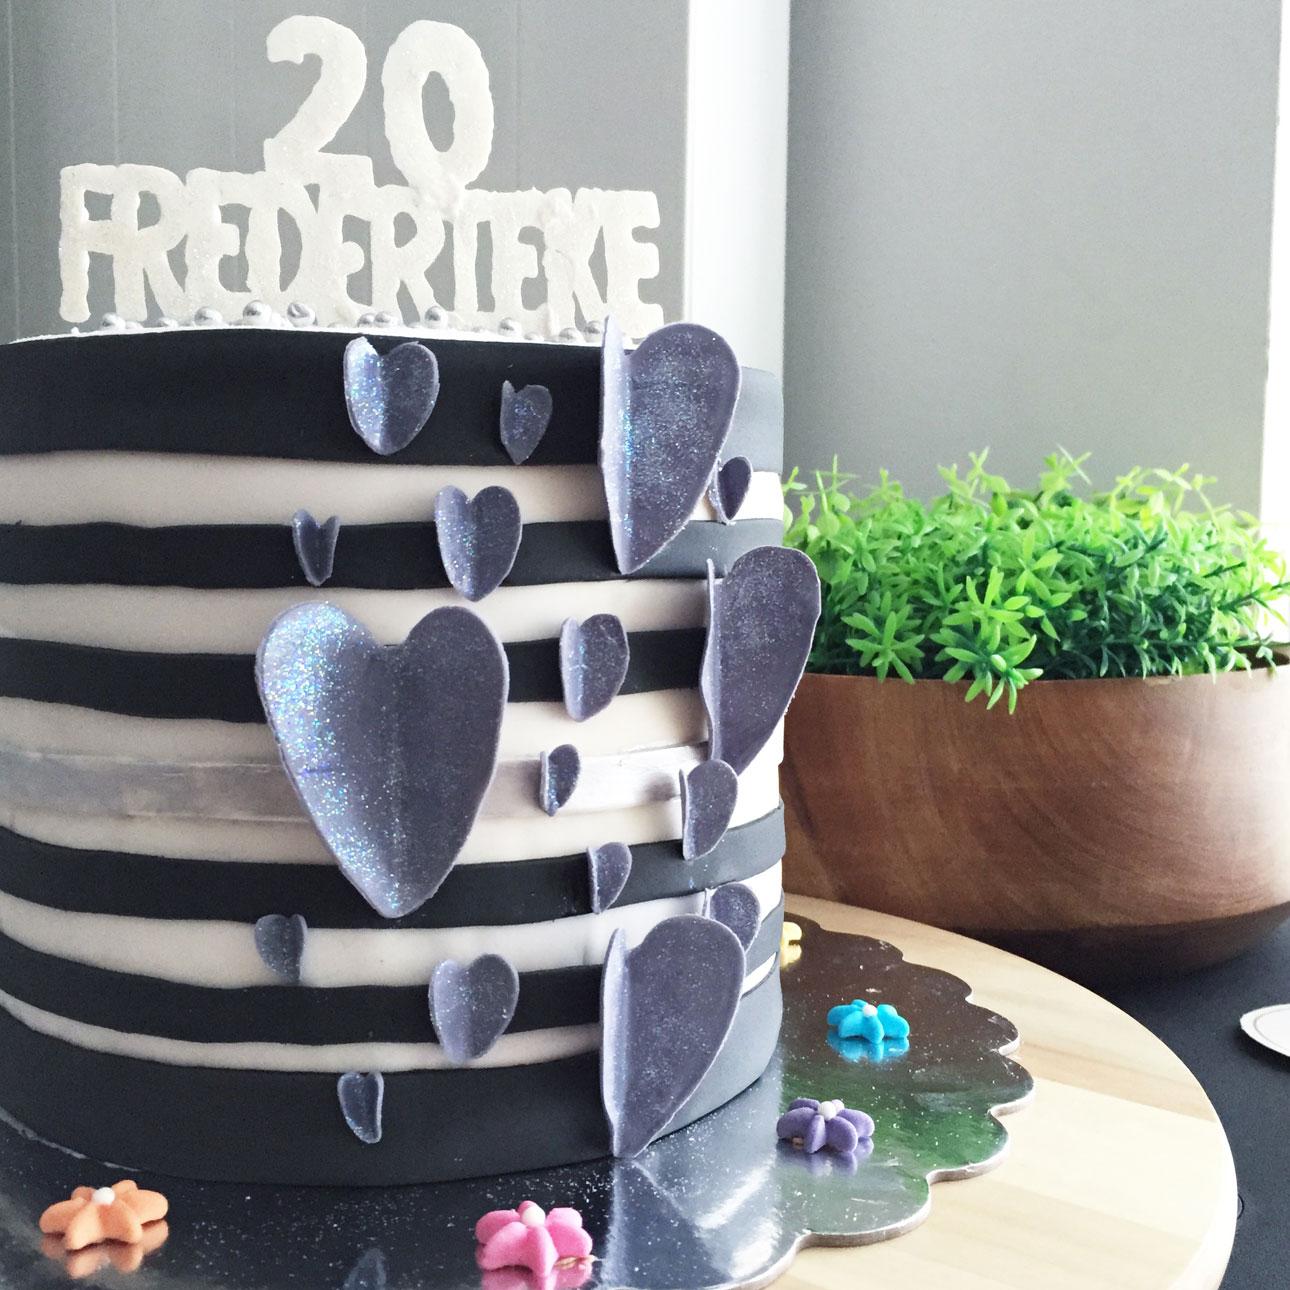 mamalifestyle februari 2016 taart-frederieke